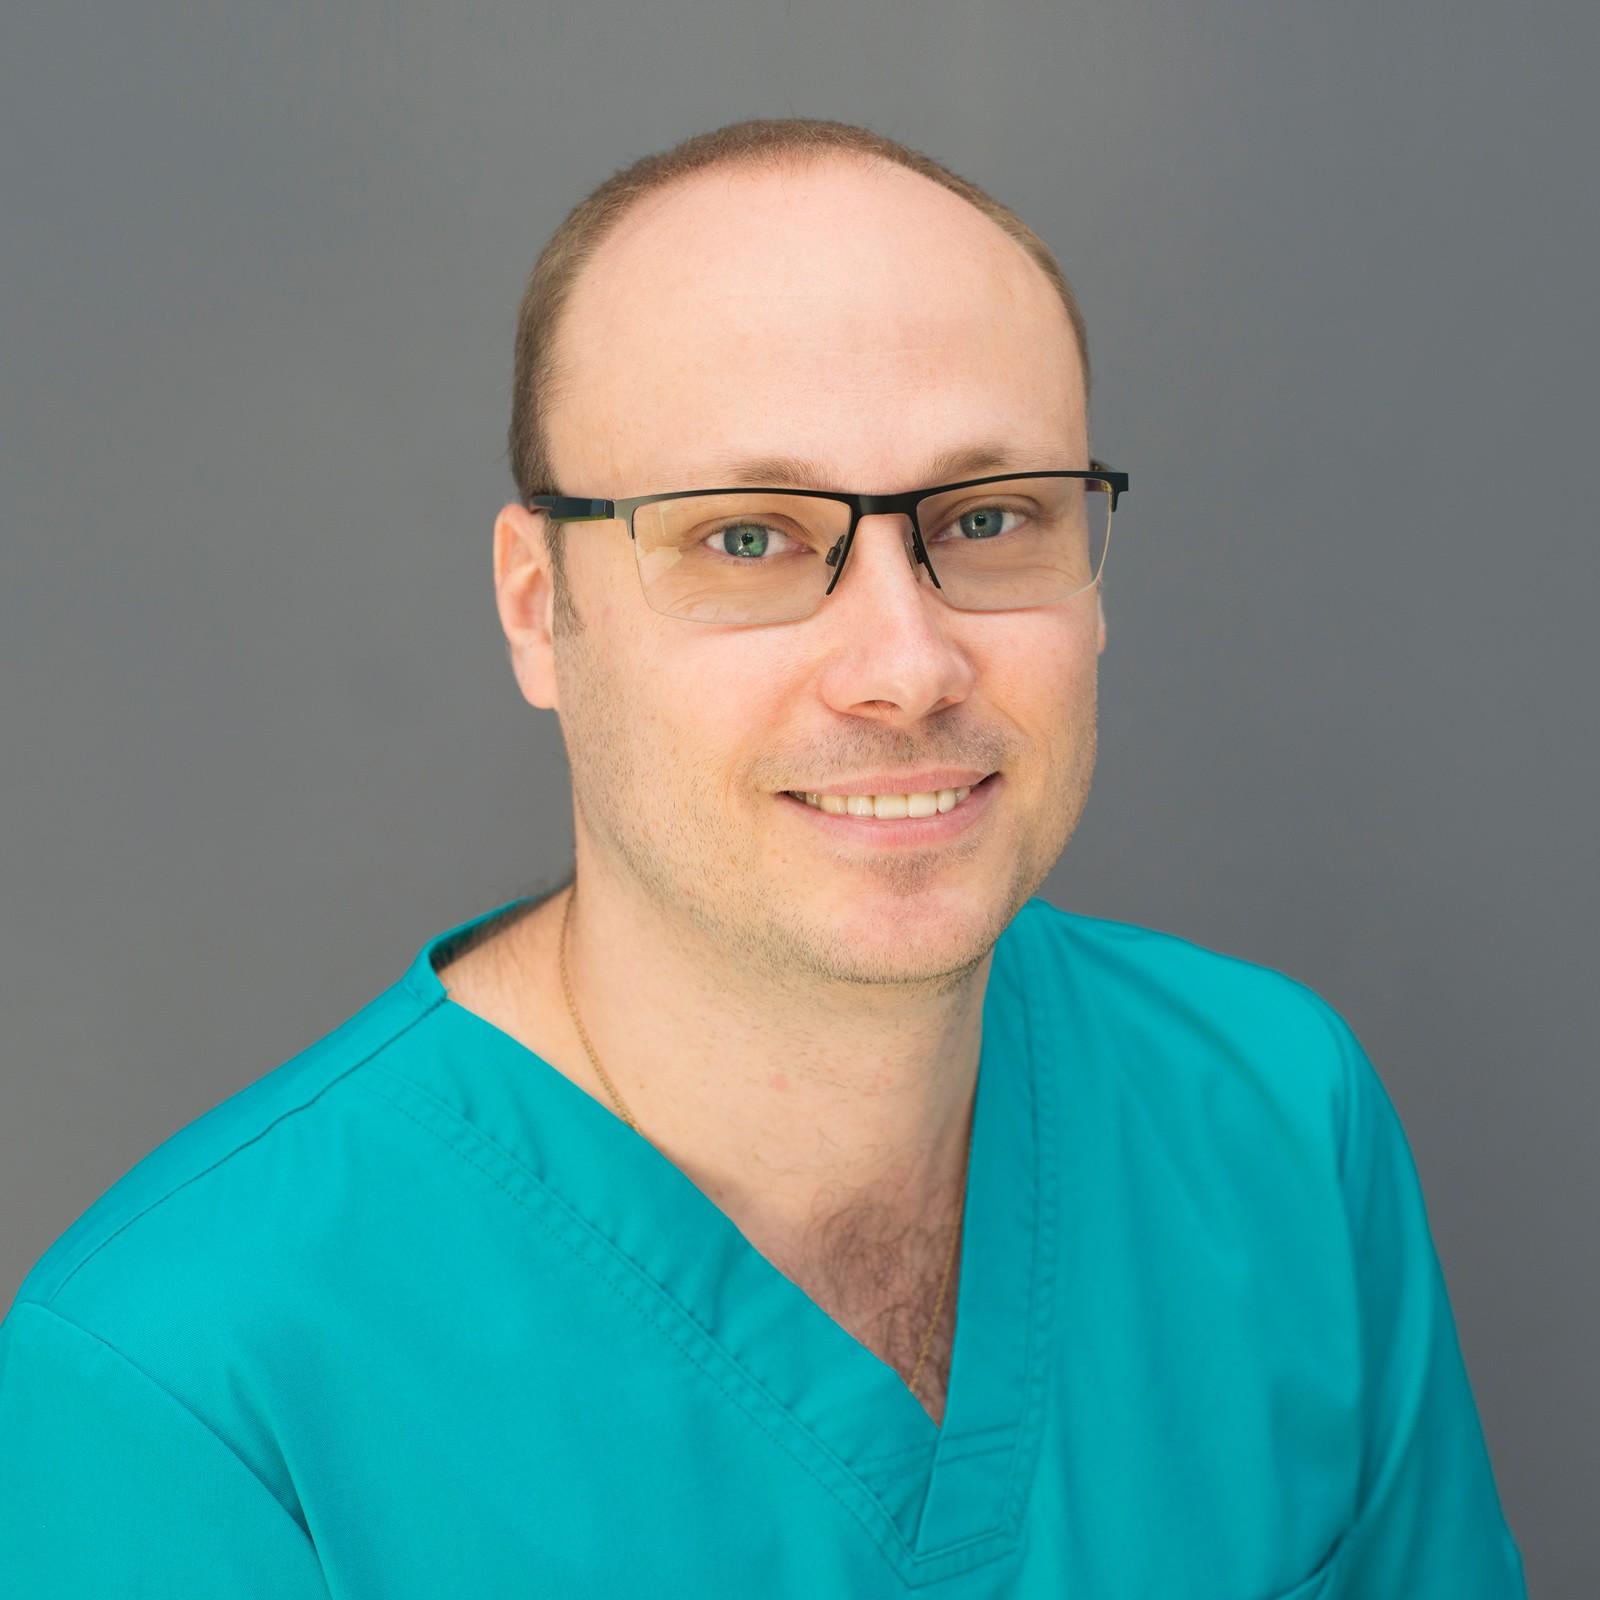 Dr. Imre Németh